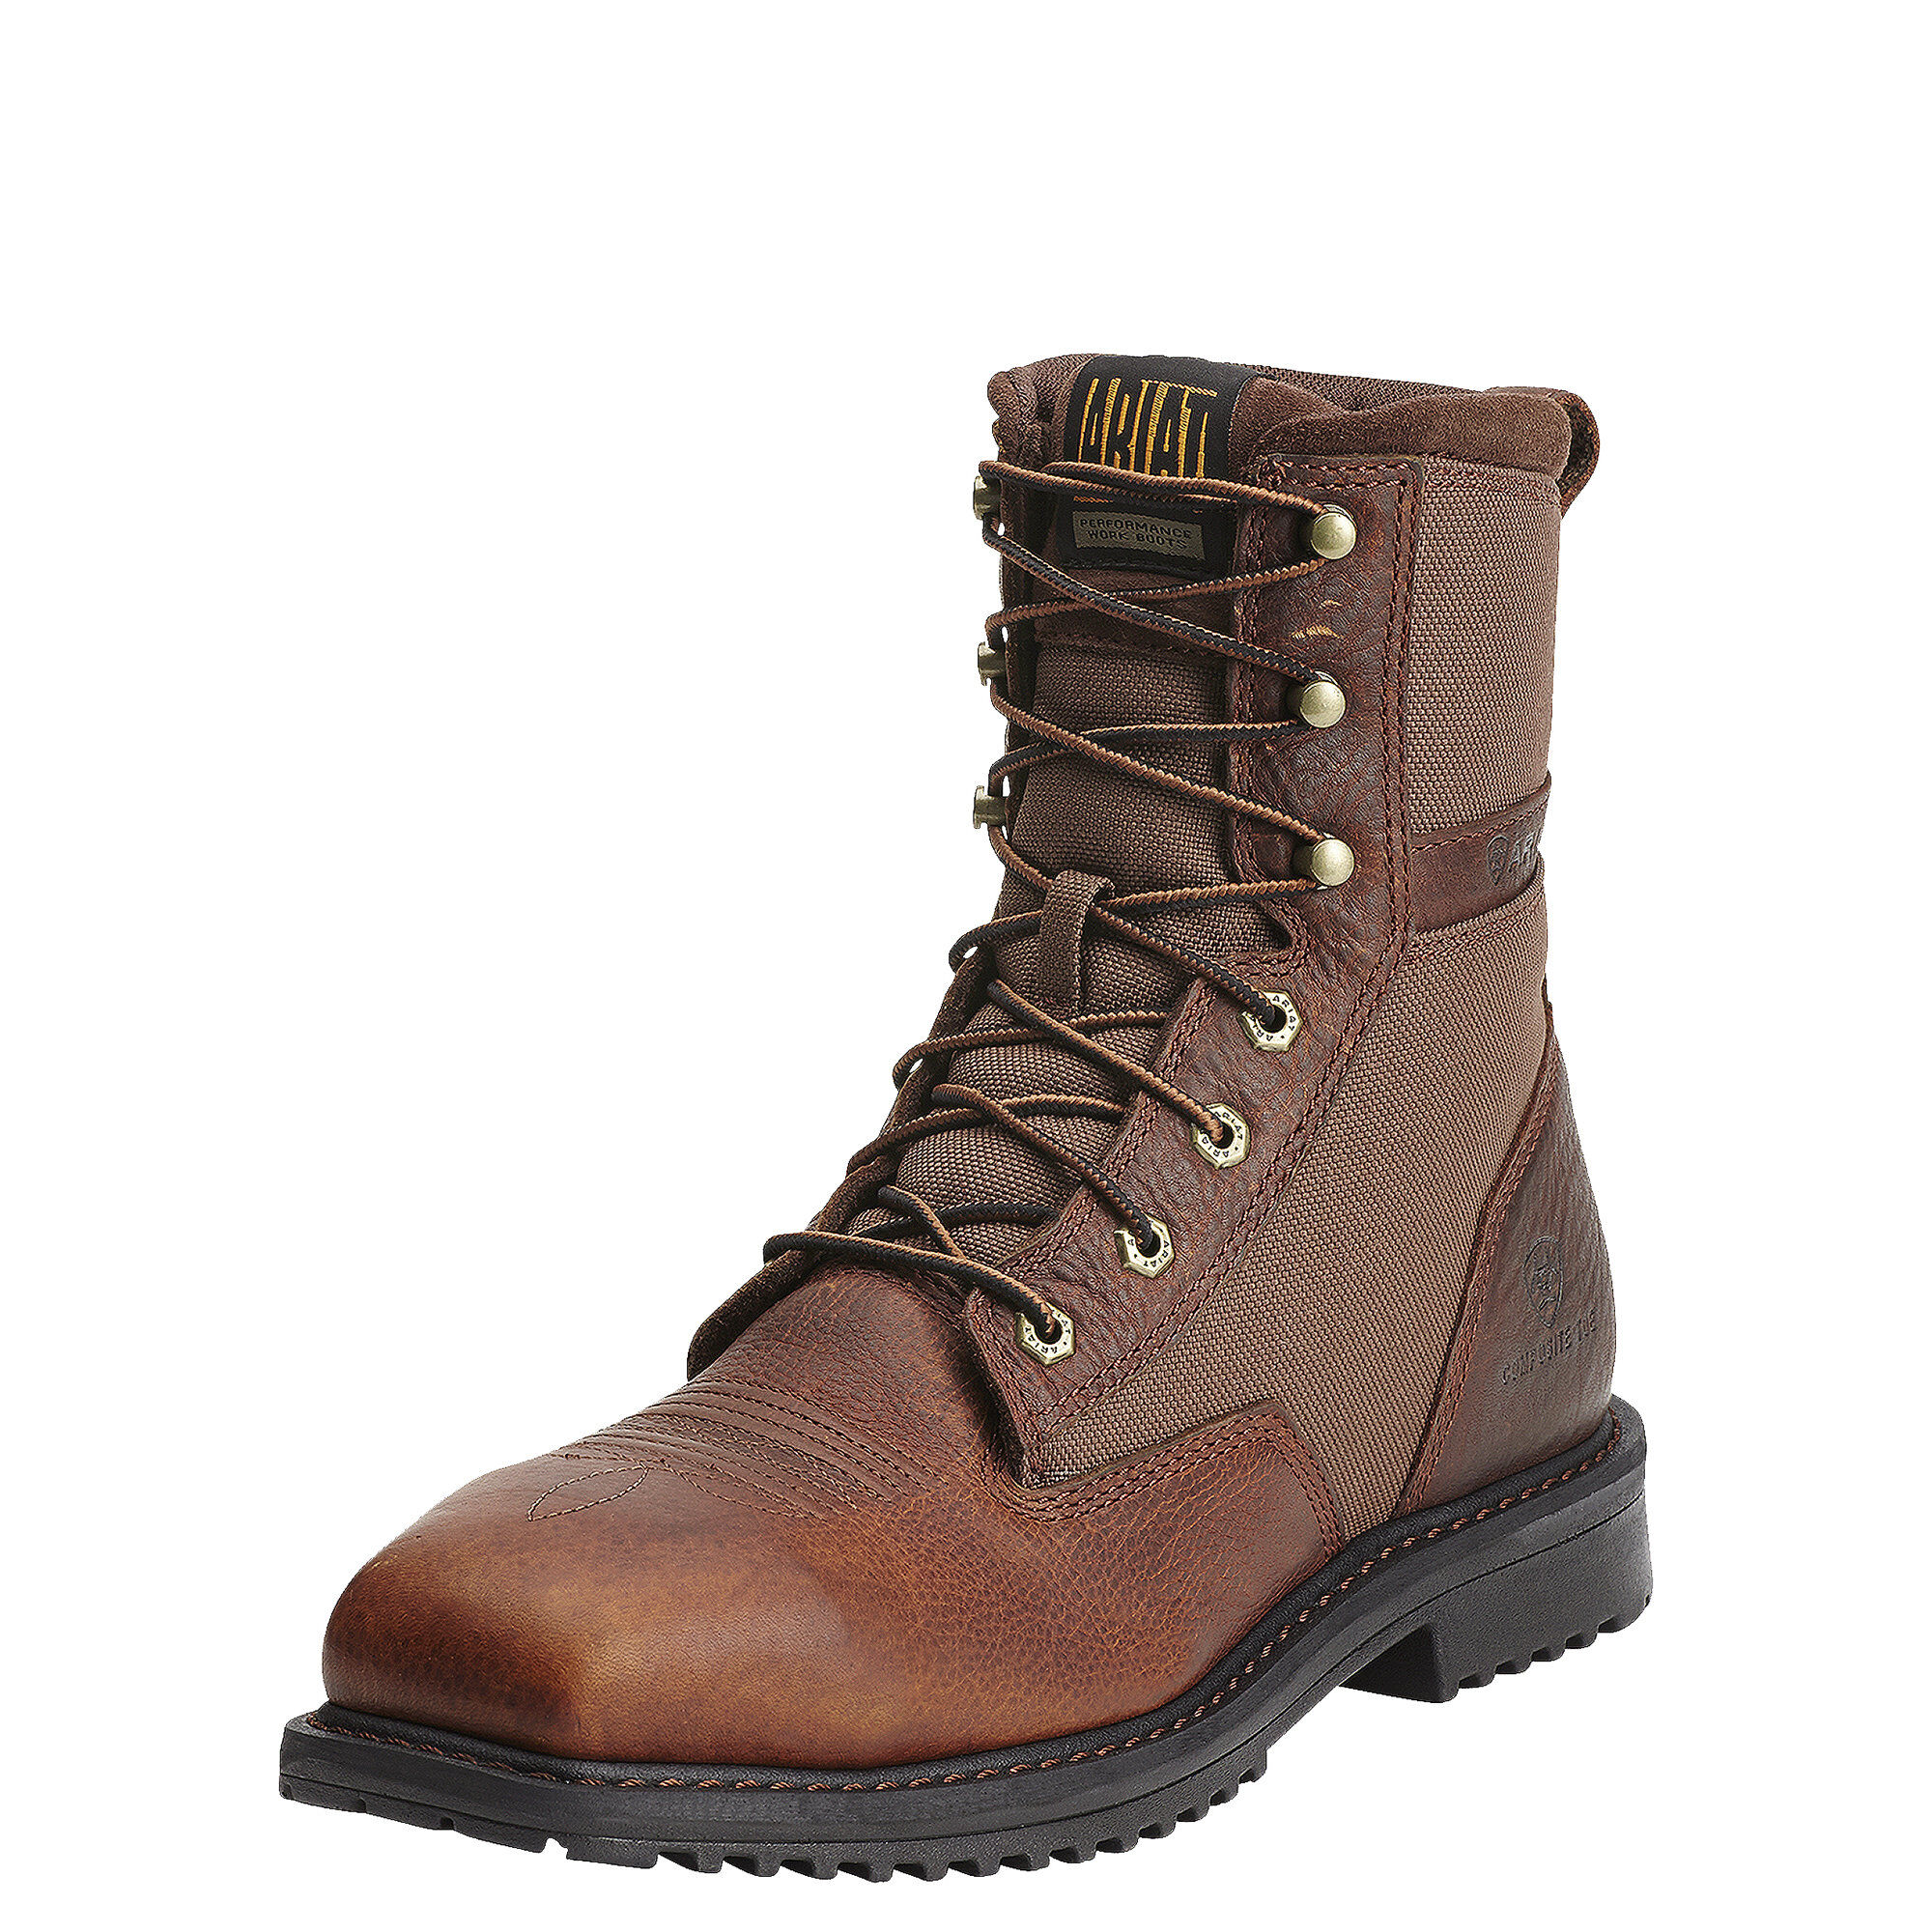 "RigTek 8"" Composite Toe Work Boot"